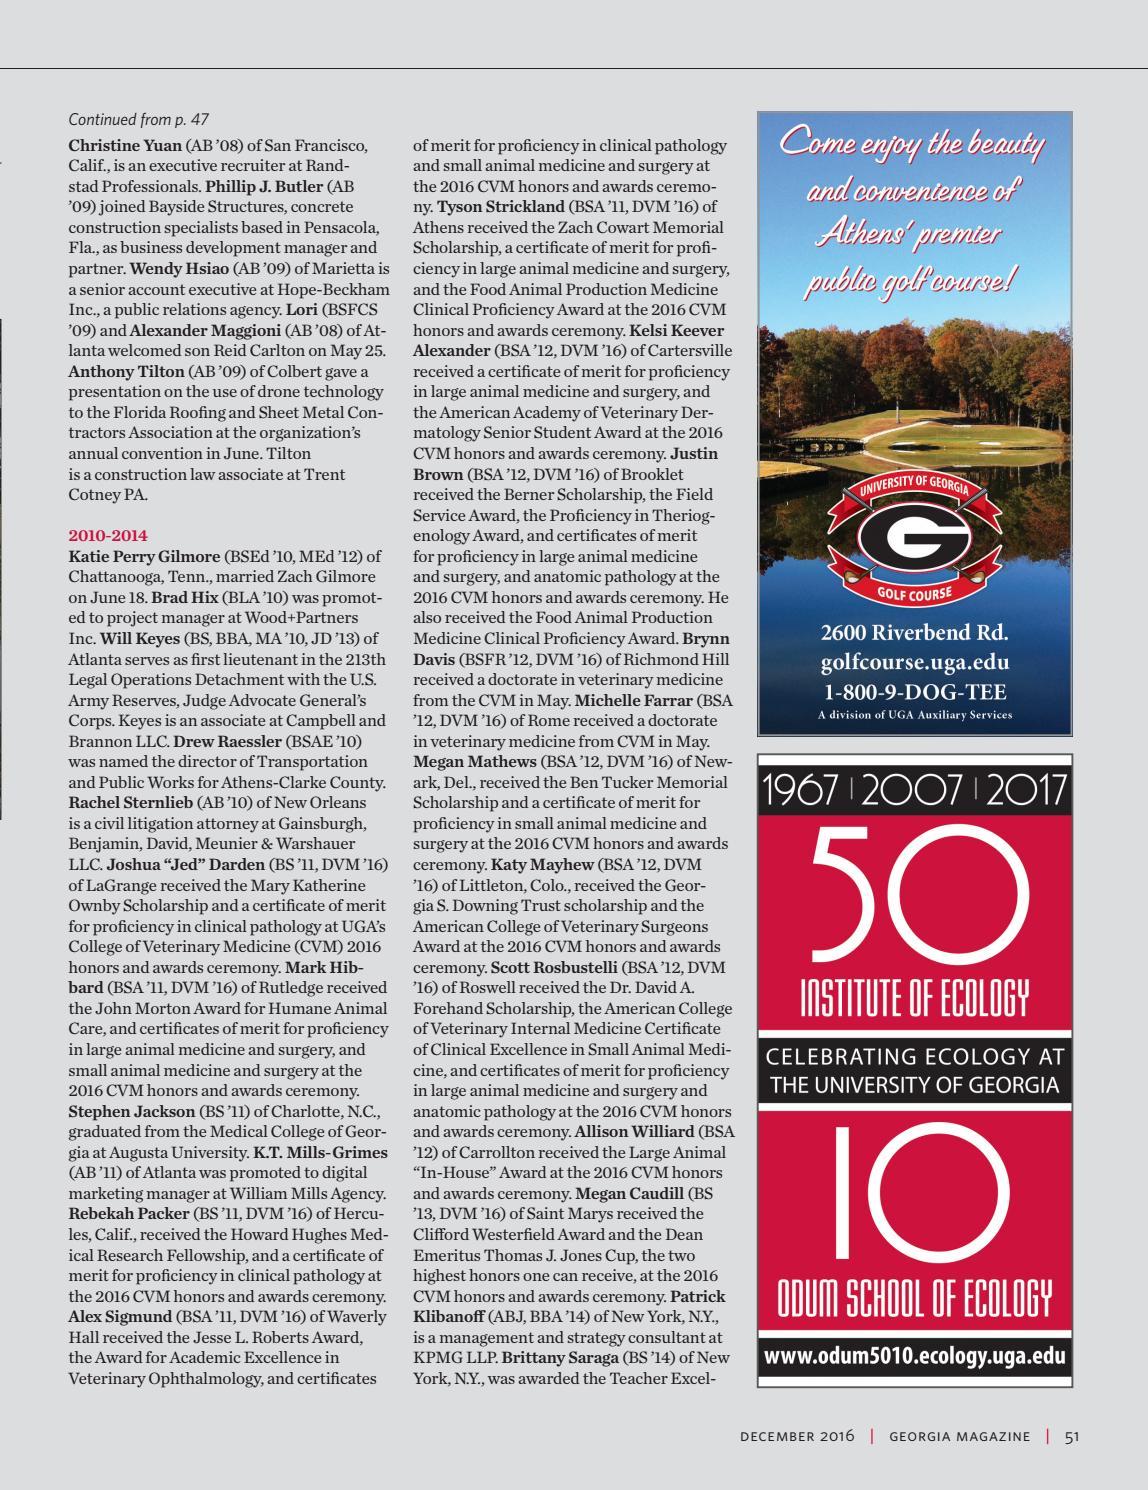 University Of Georgia Magazine December 2016 By University